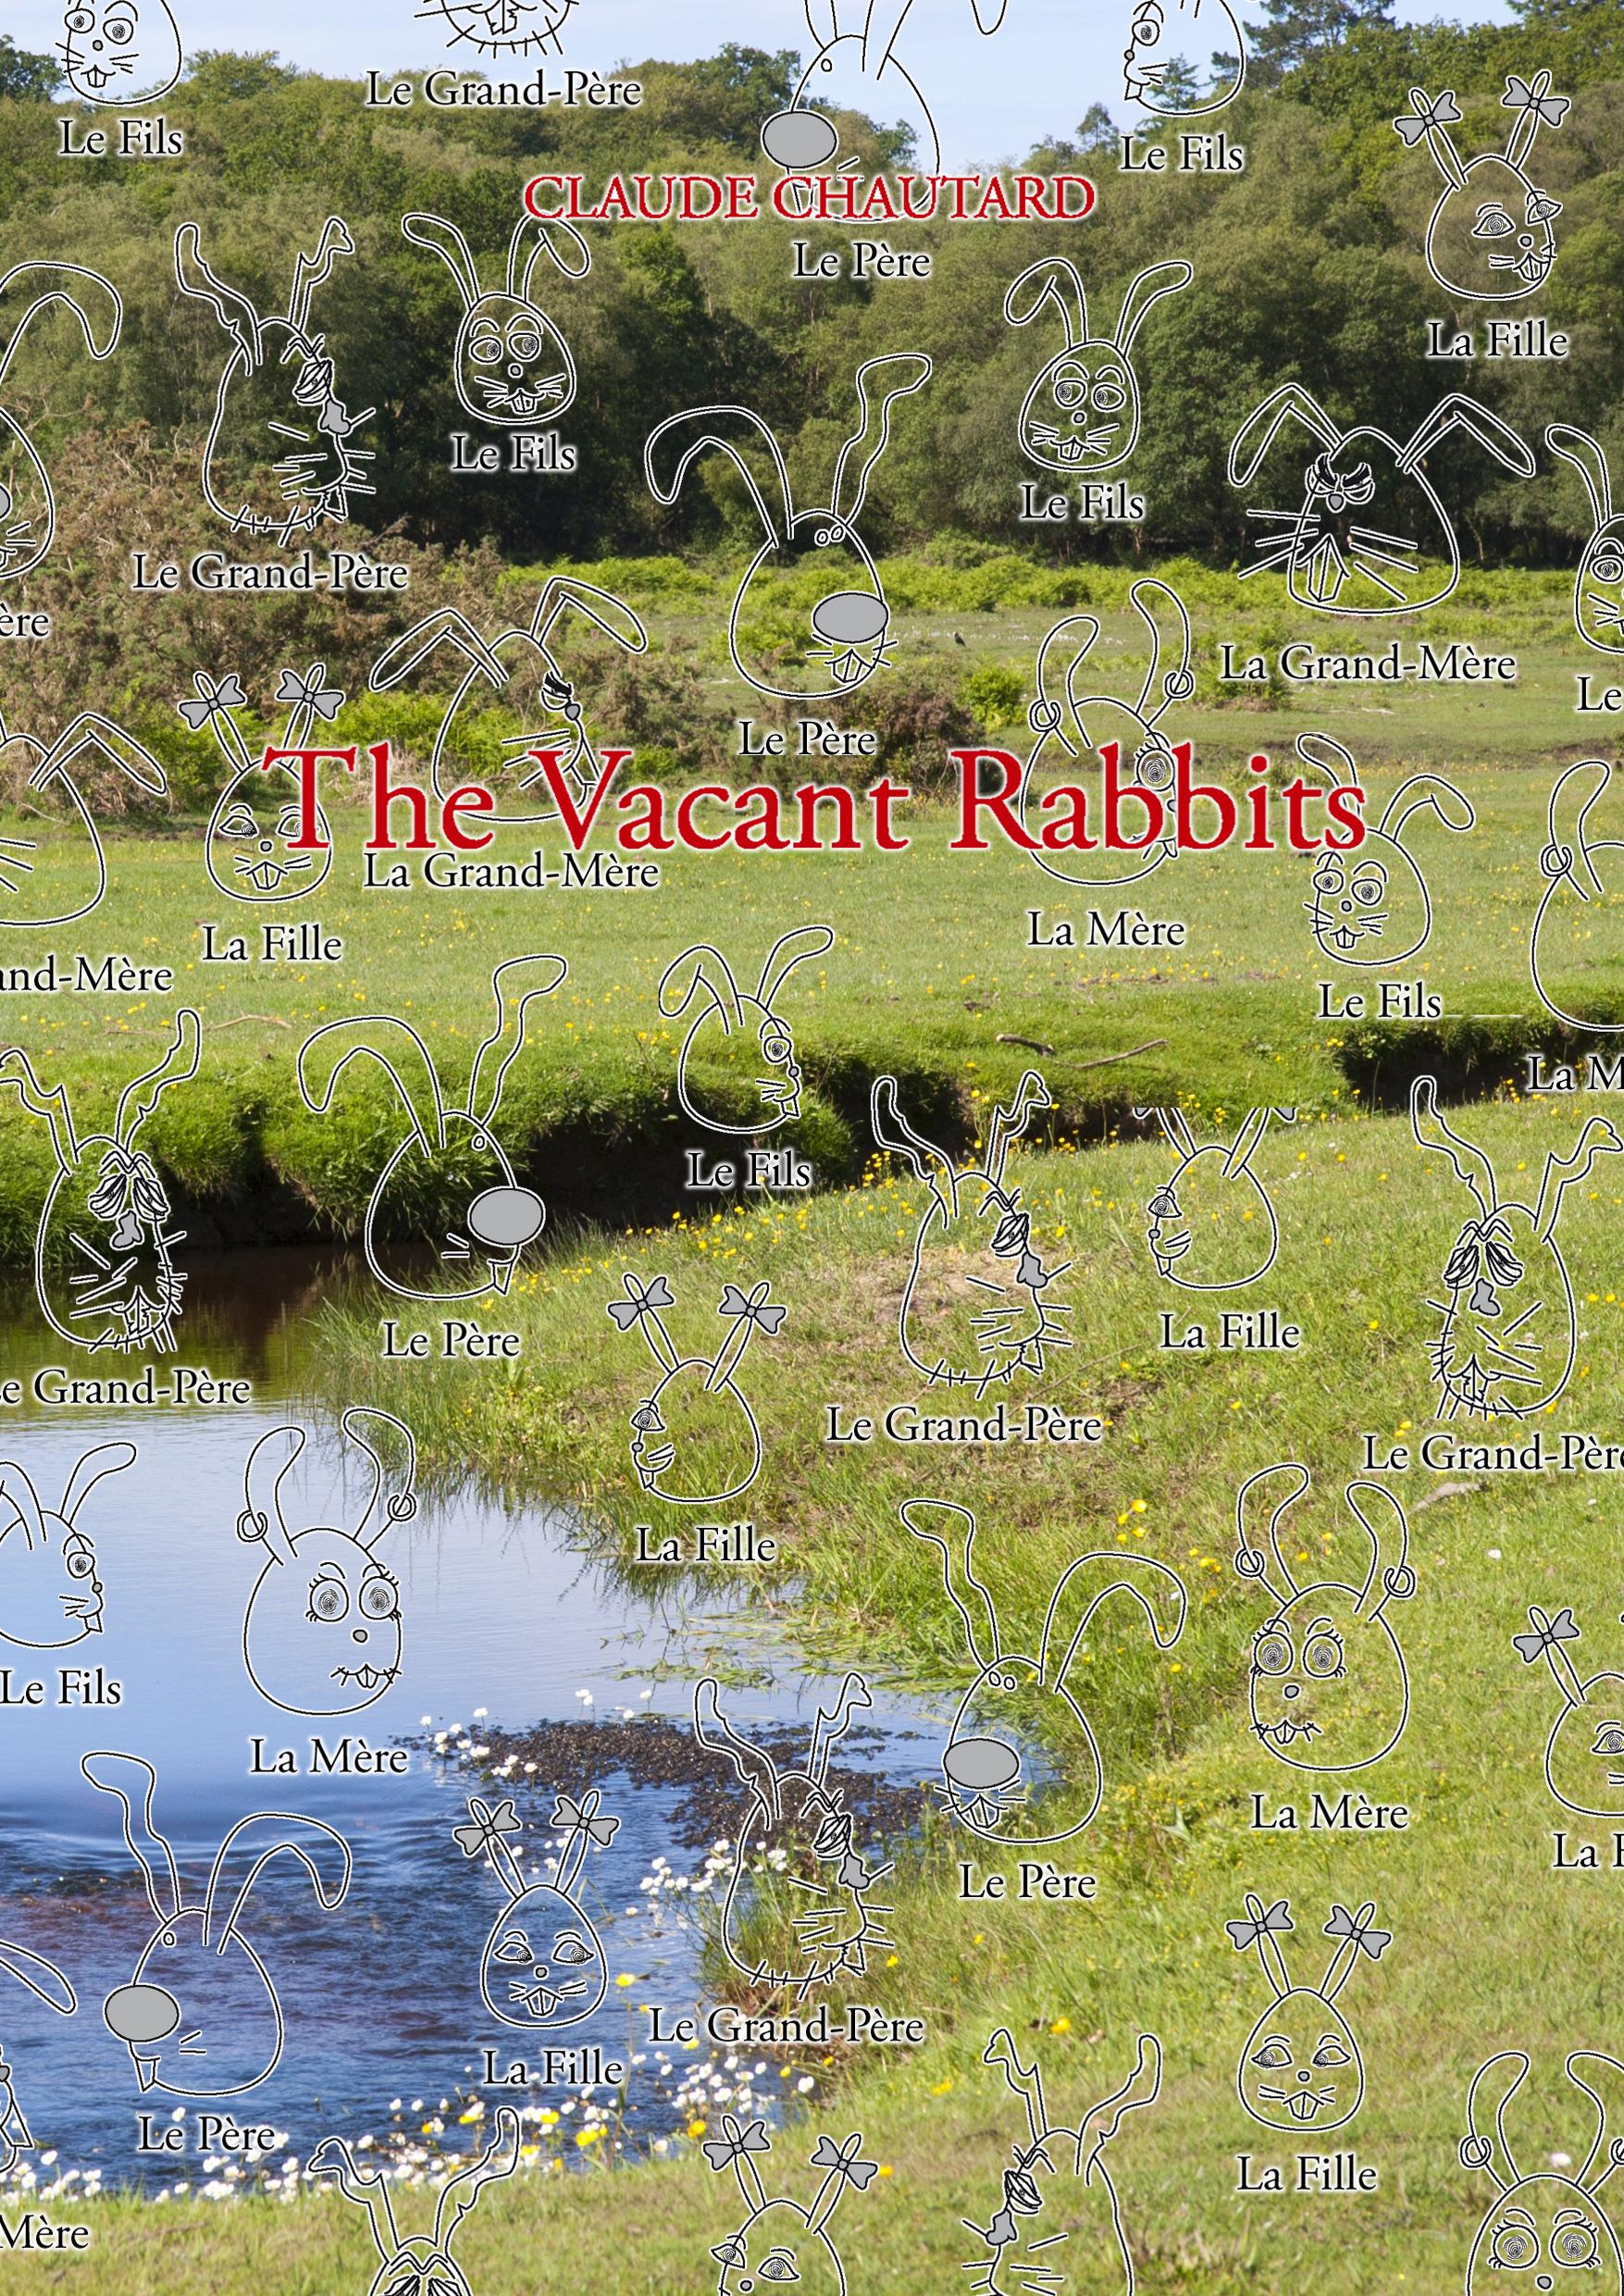 The Vacant Rabbits